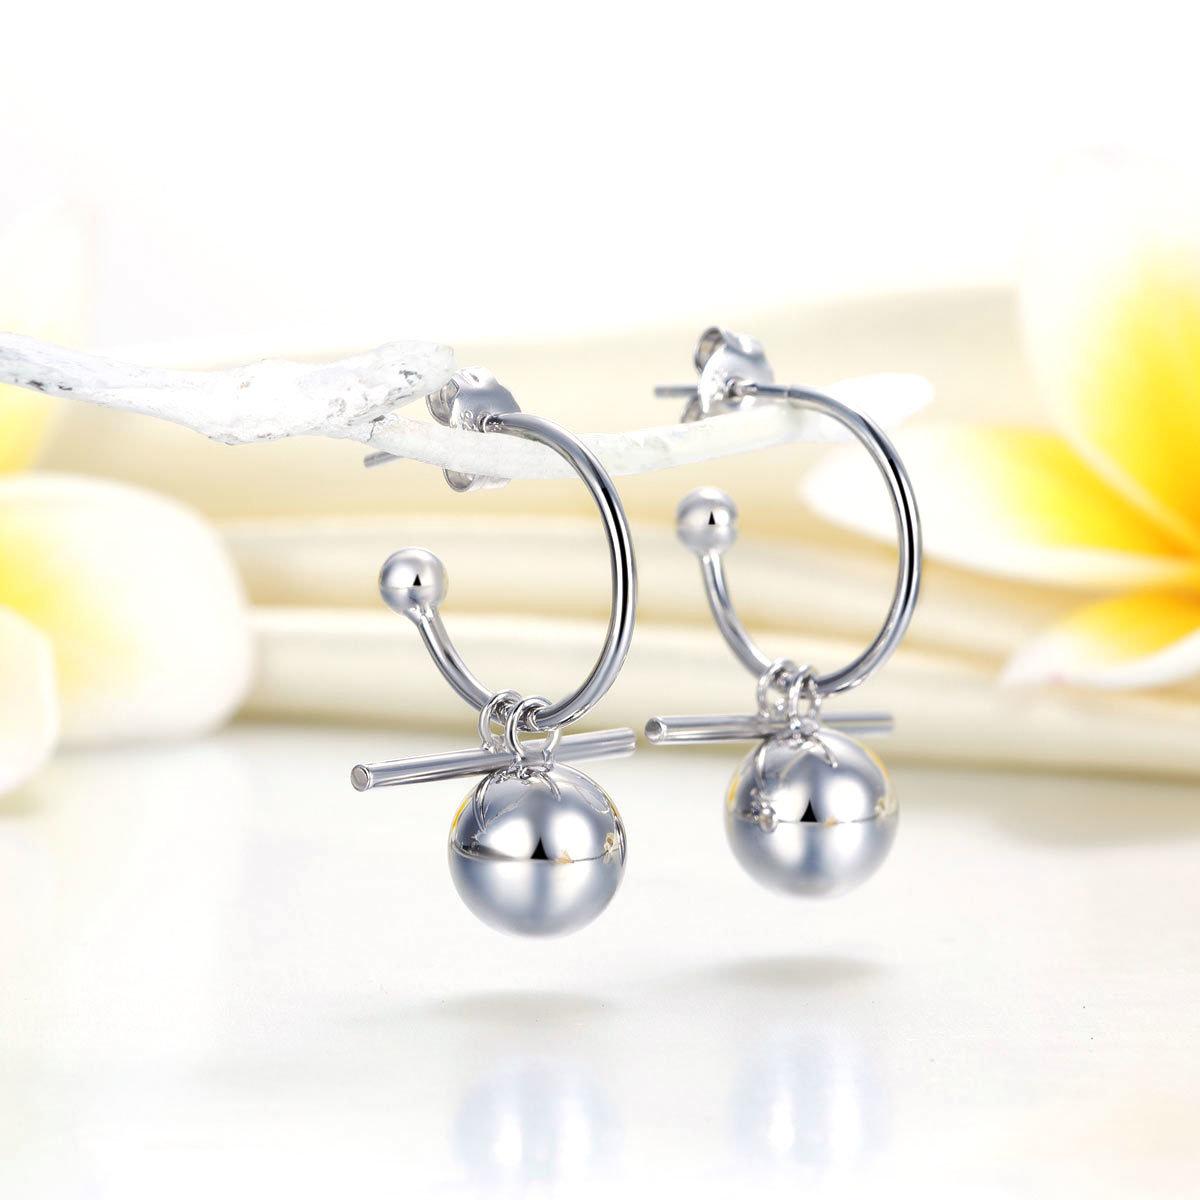 Dangle Balls 925 Pure Silver Earrings